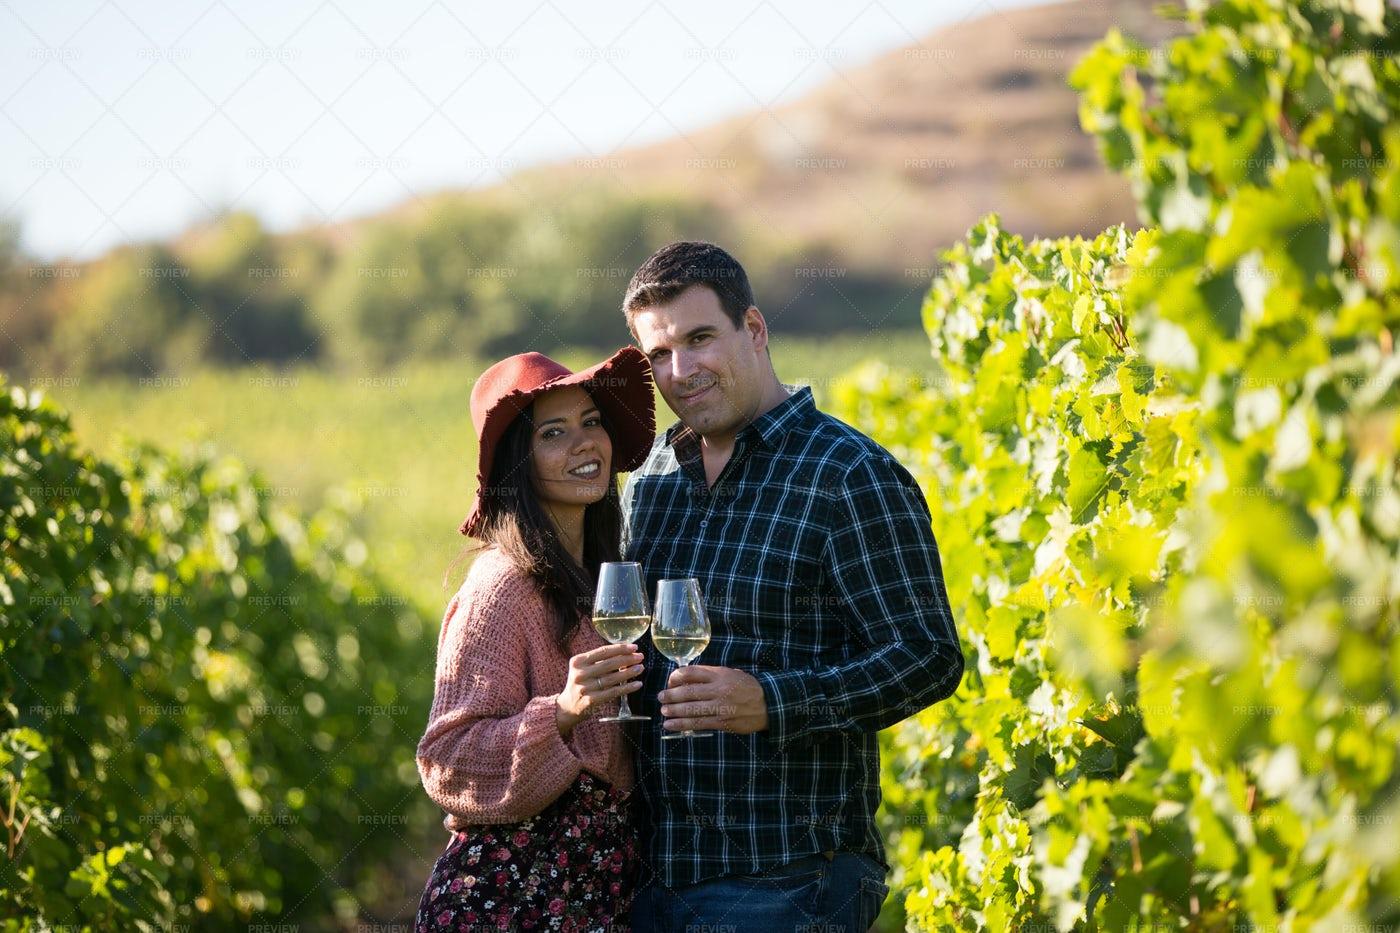 Toasting On A Green Vineyard: Stock Photos